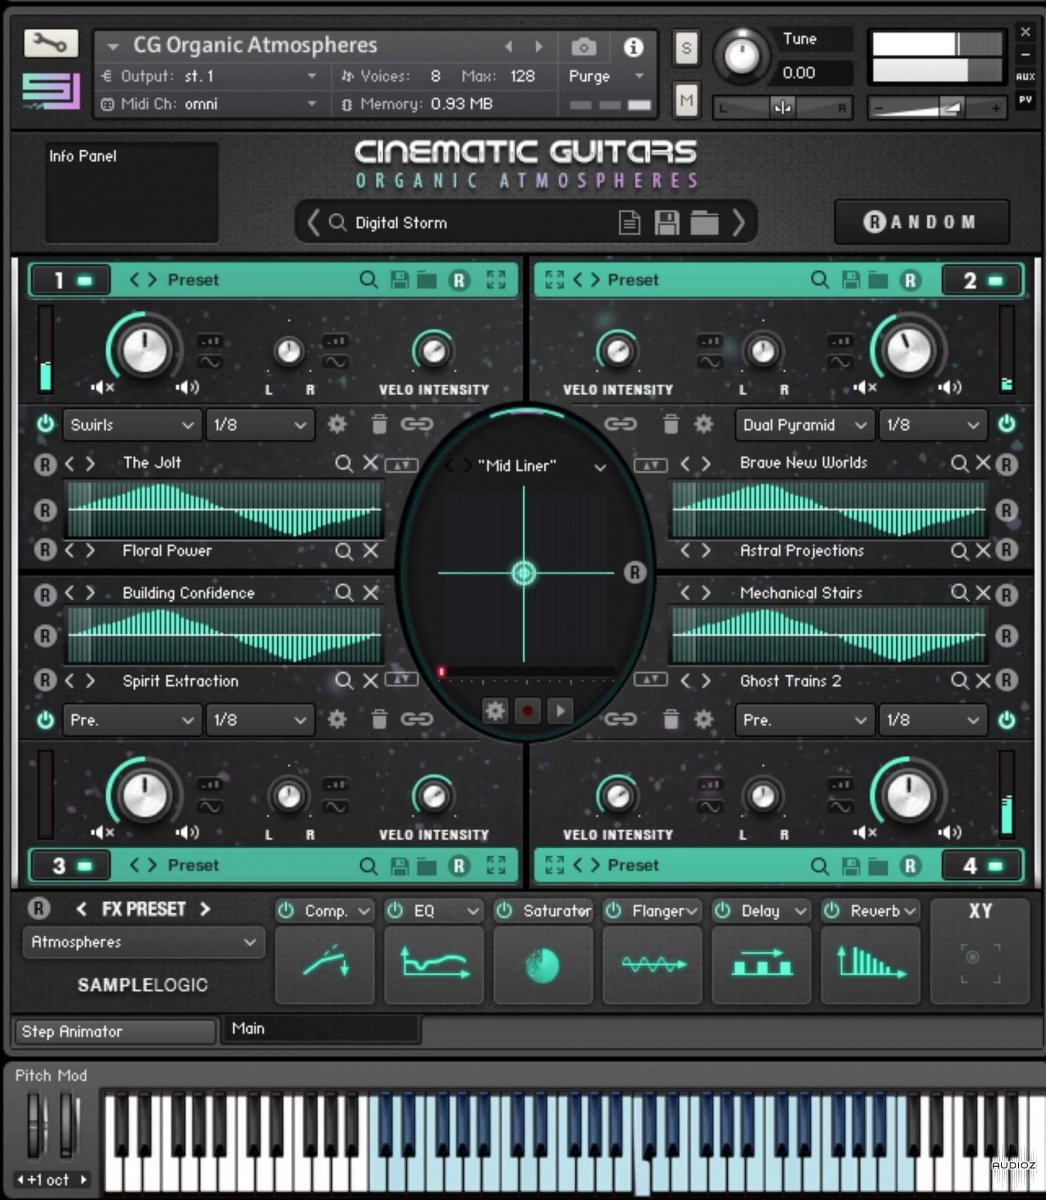 Kontakt 5 manual download - Free Kontakt 5 Original Library Download Sample Logic Cinematic Guitars Organic Atmospheres Kontakt Synthic4te Screenshot